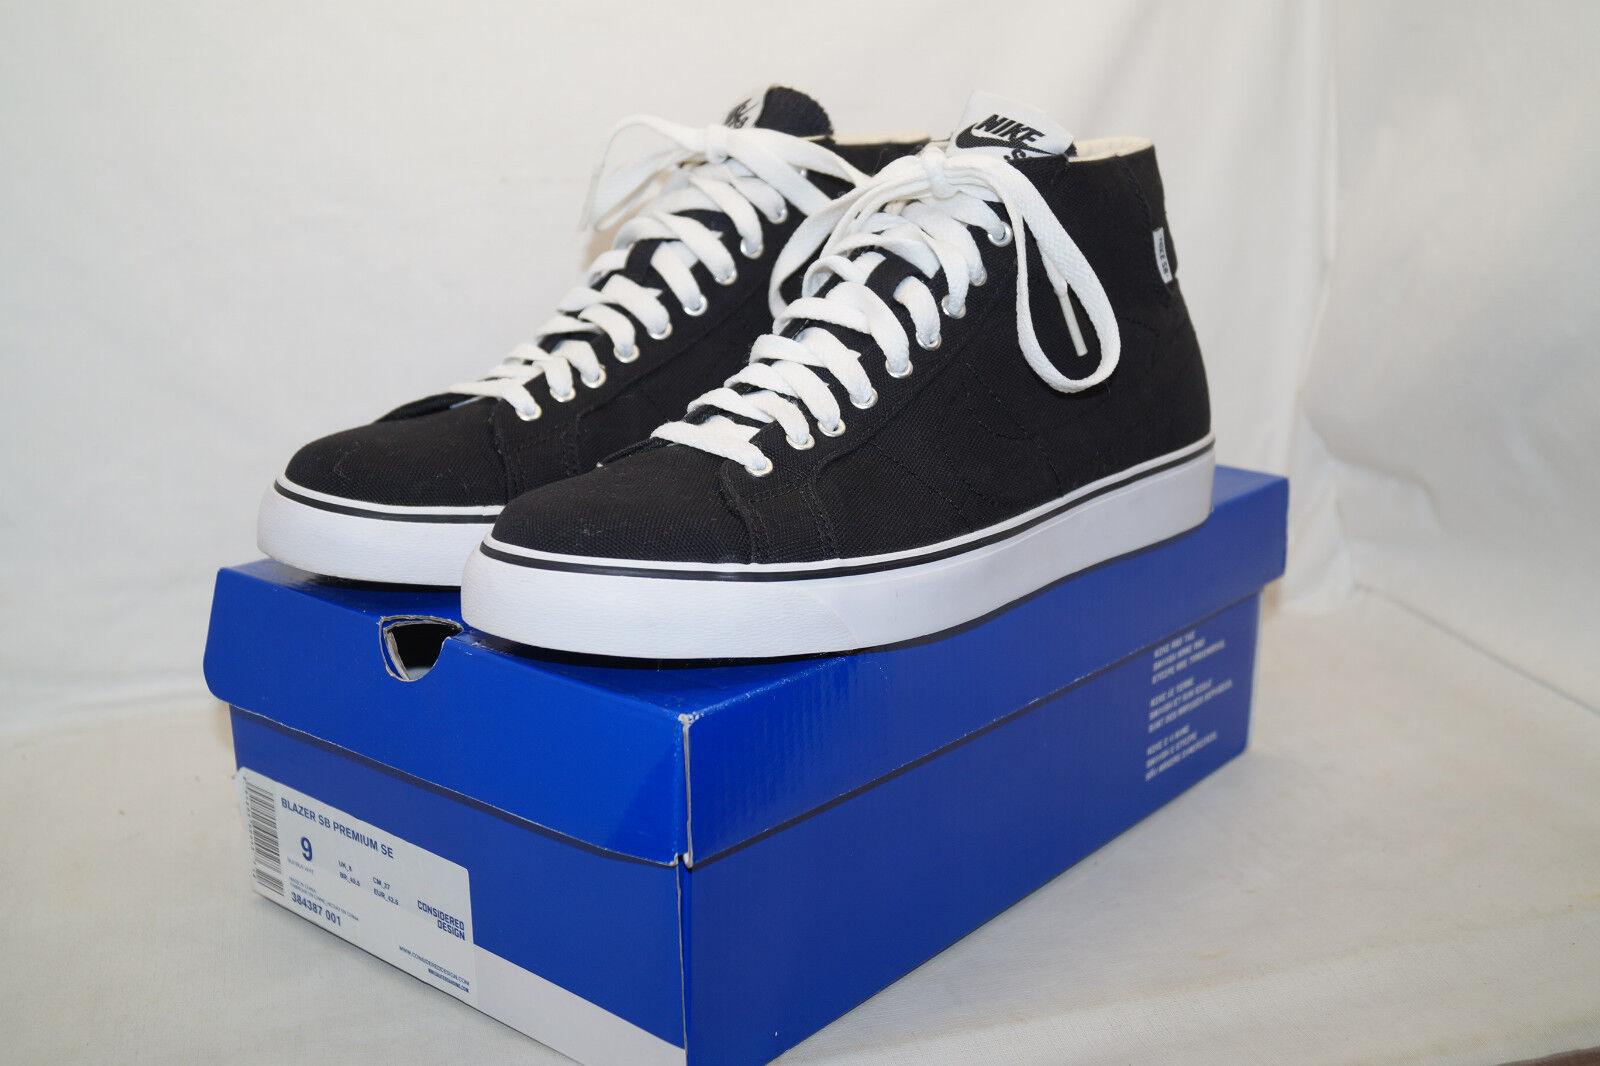 Nike BLAZER SB PREMIUM SE  HUF CITY DIRTBAGS  Gr 42,5 UK 8 schwarz 384387 001    | Outlet Store